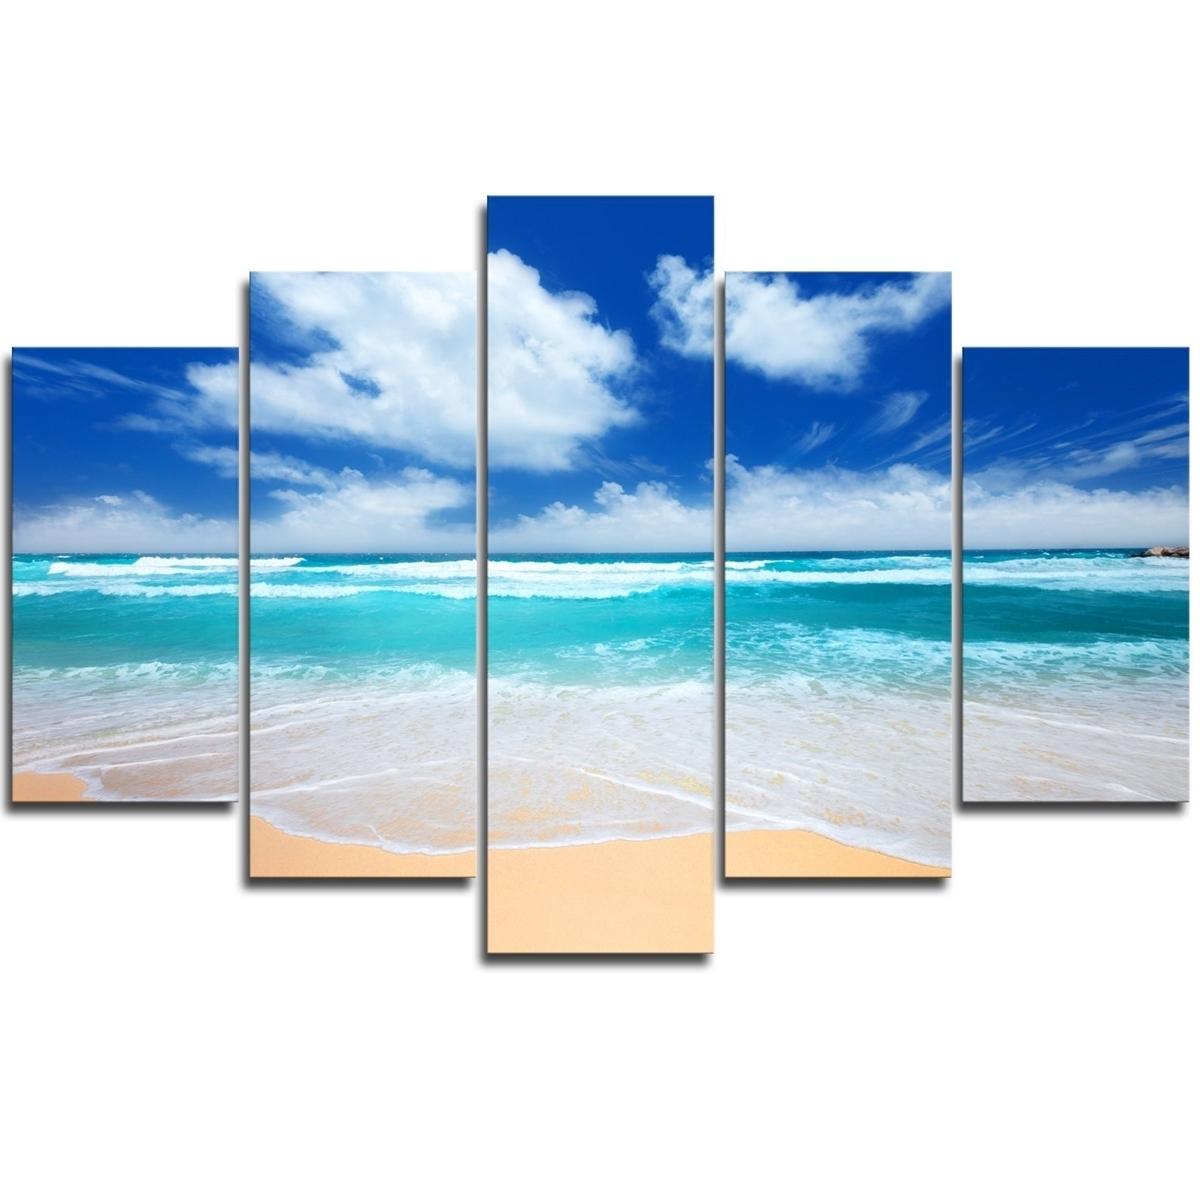 Beach Wall Art With Well Known Piece Framed Canvas Beach Wall Art Sunrise Beach Seascape (View 6 of 15)